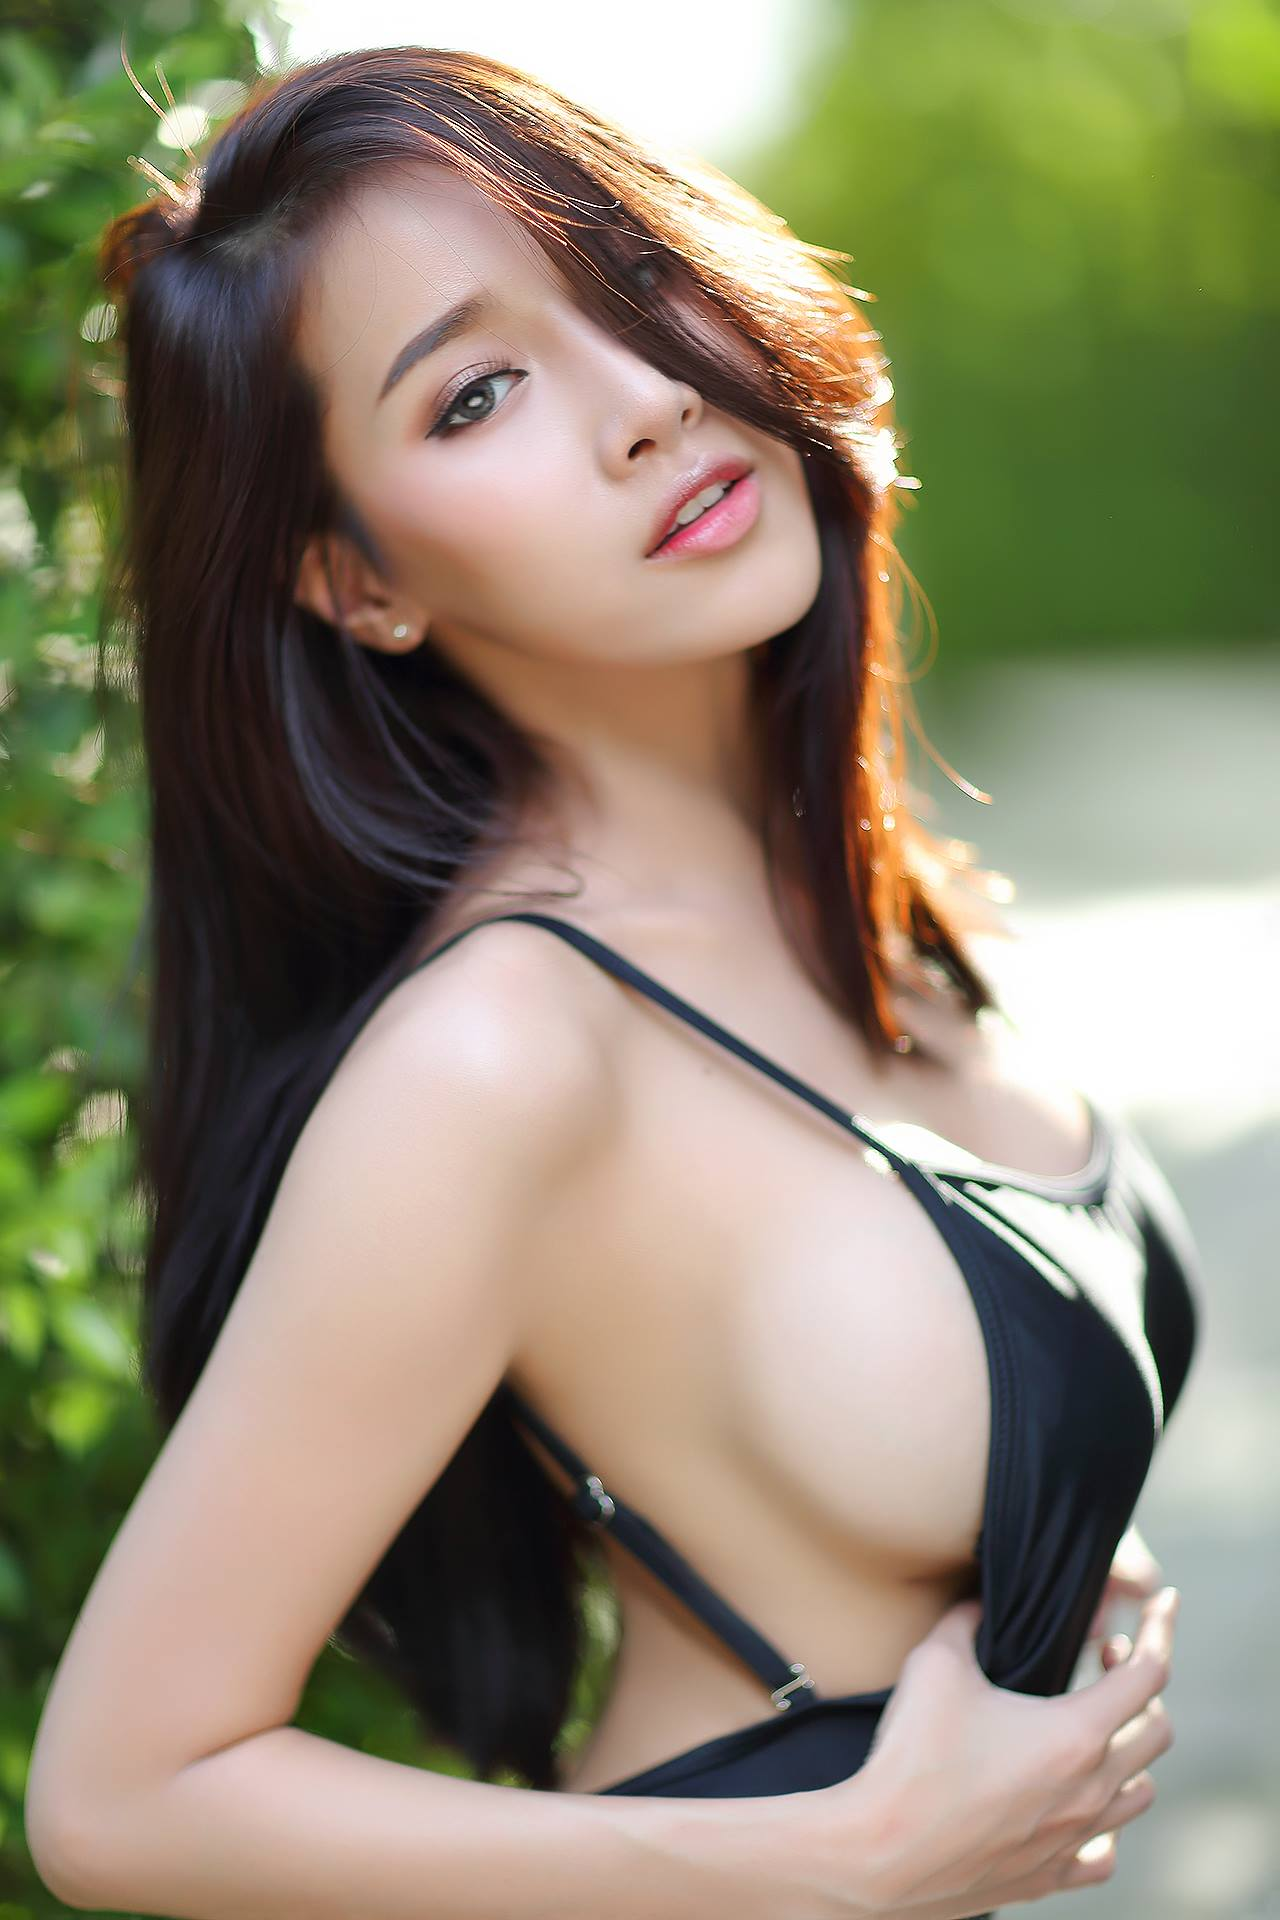 Thai girls images, stock photos vectors